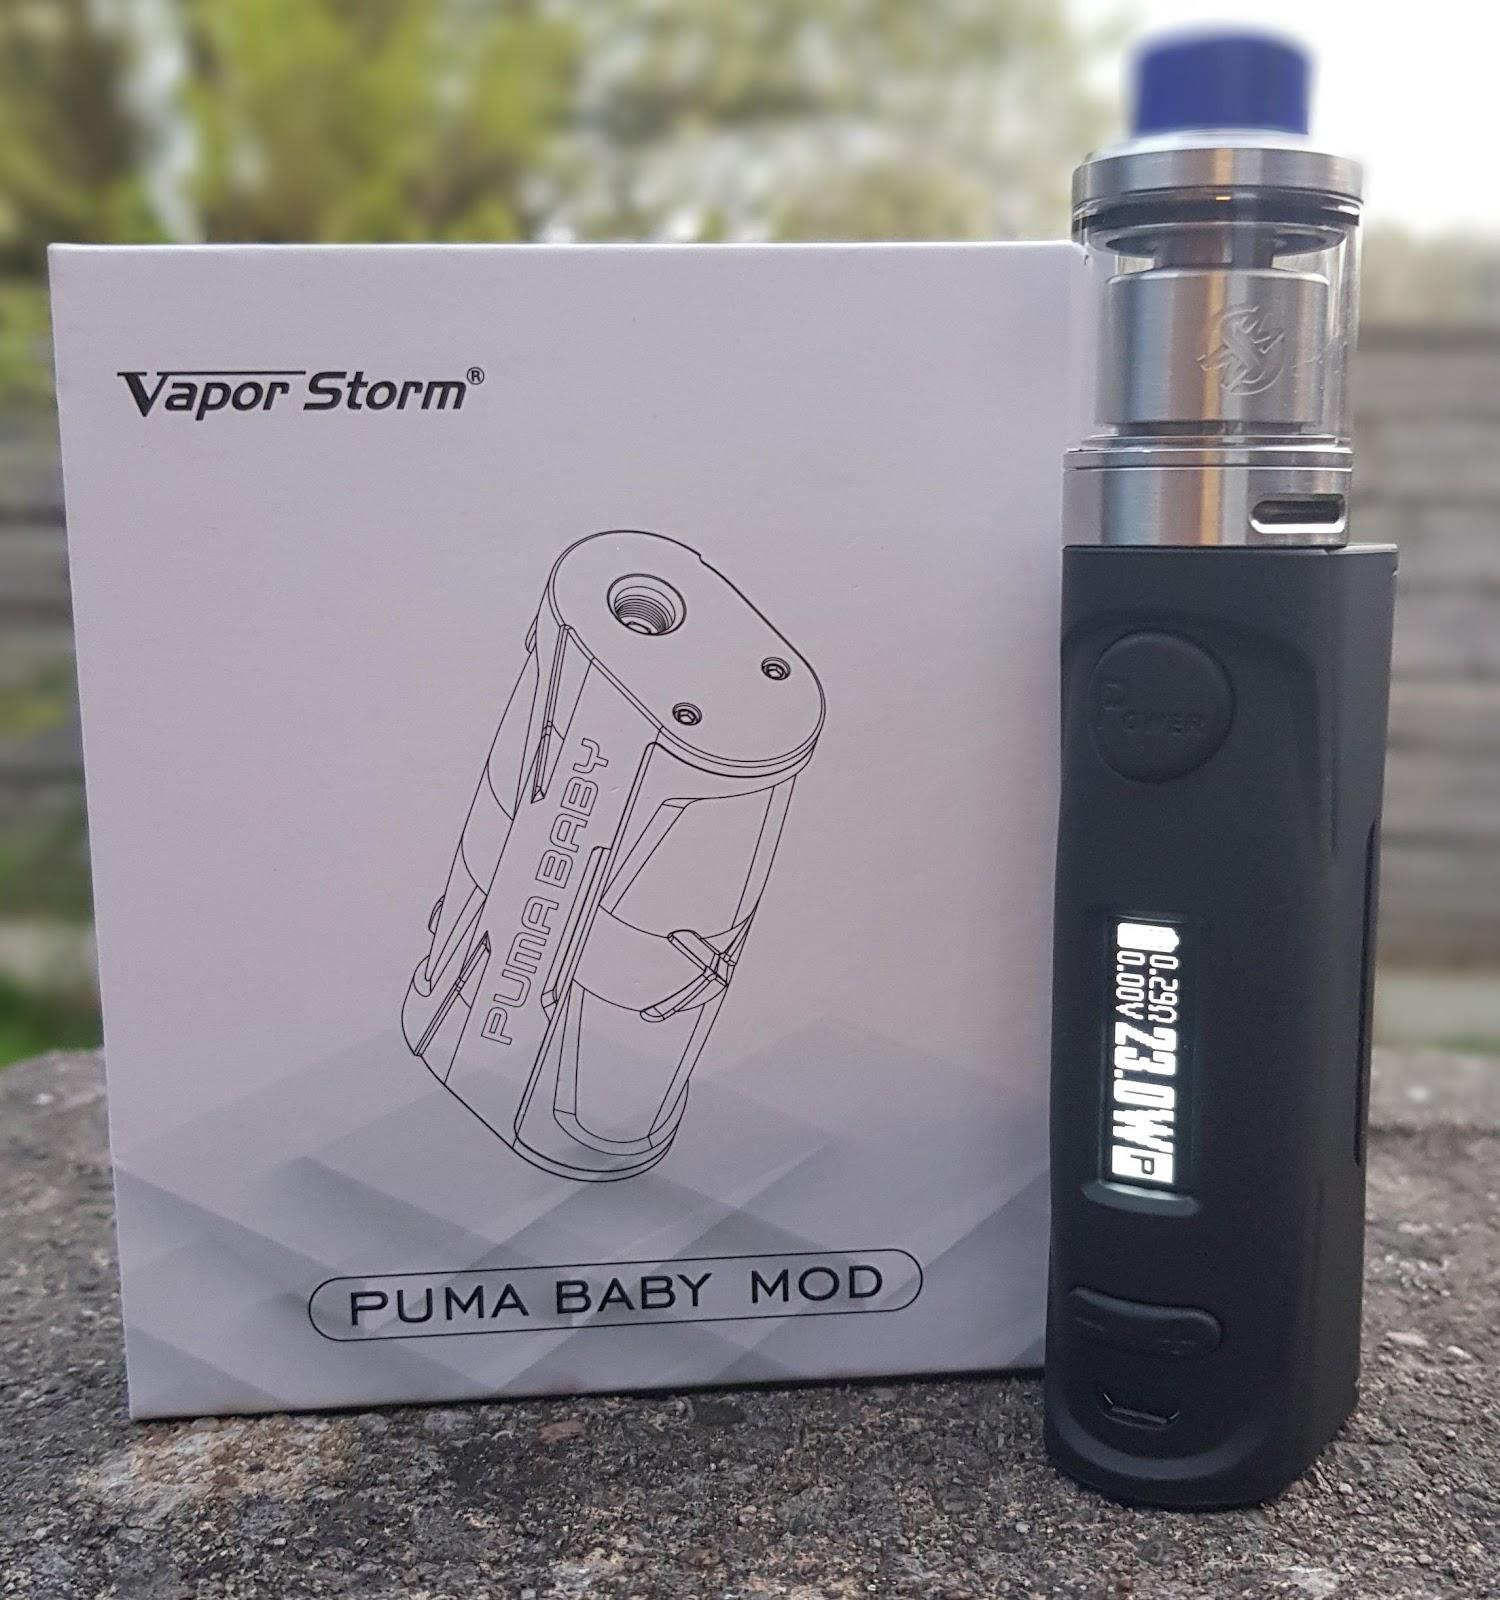 Vapor Storm Puma Baby Mod